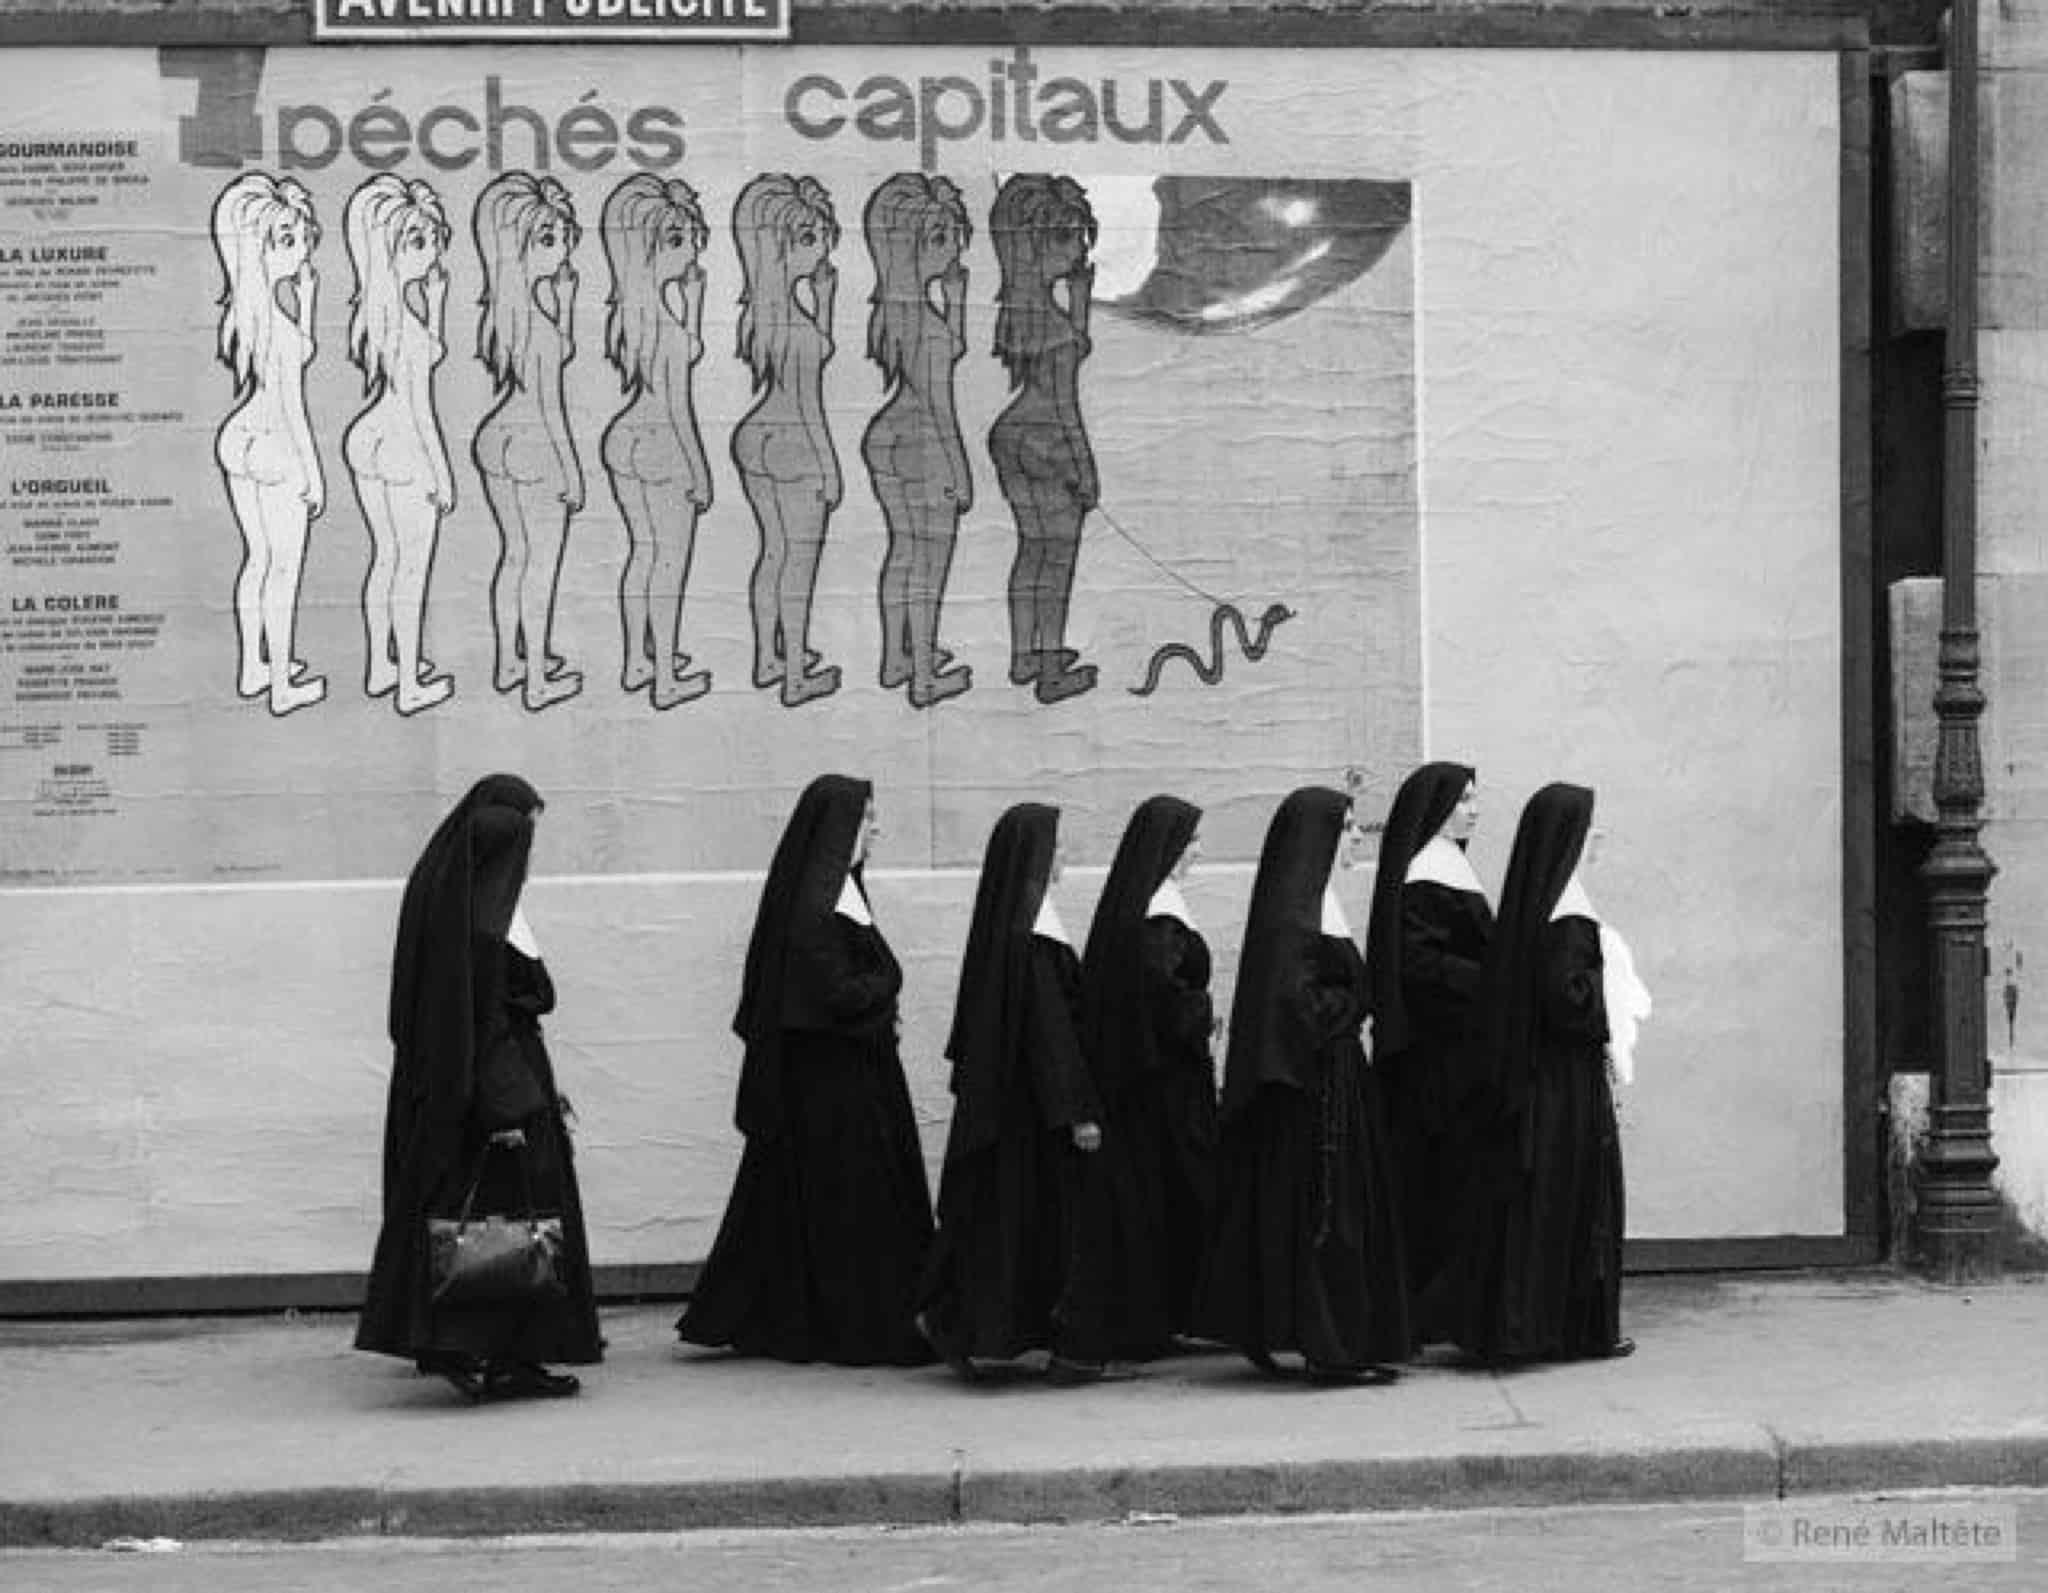 7 Deadly Sins – René Maltête street photograph